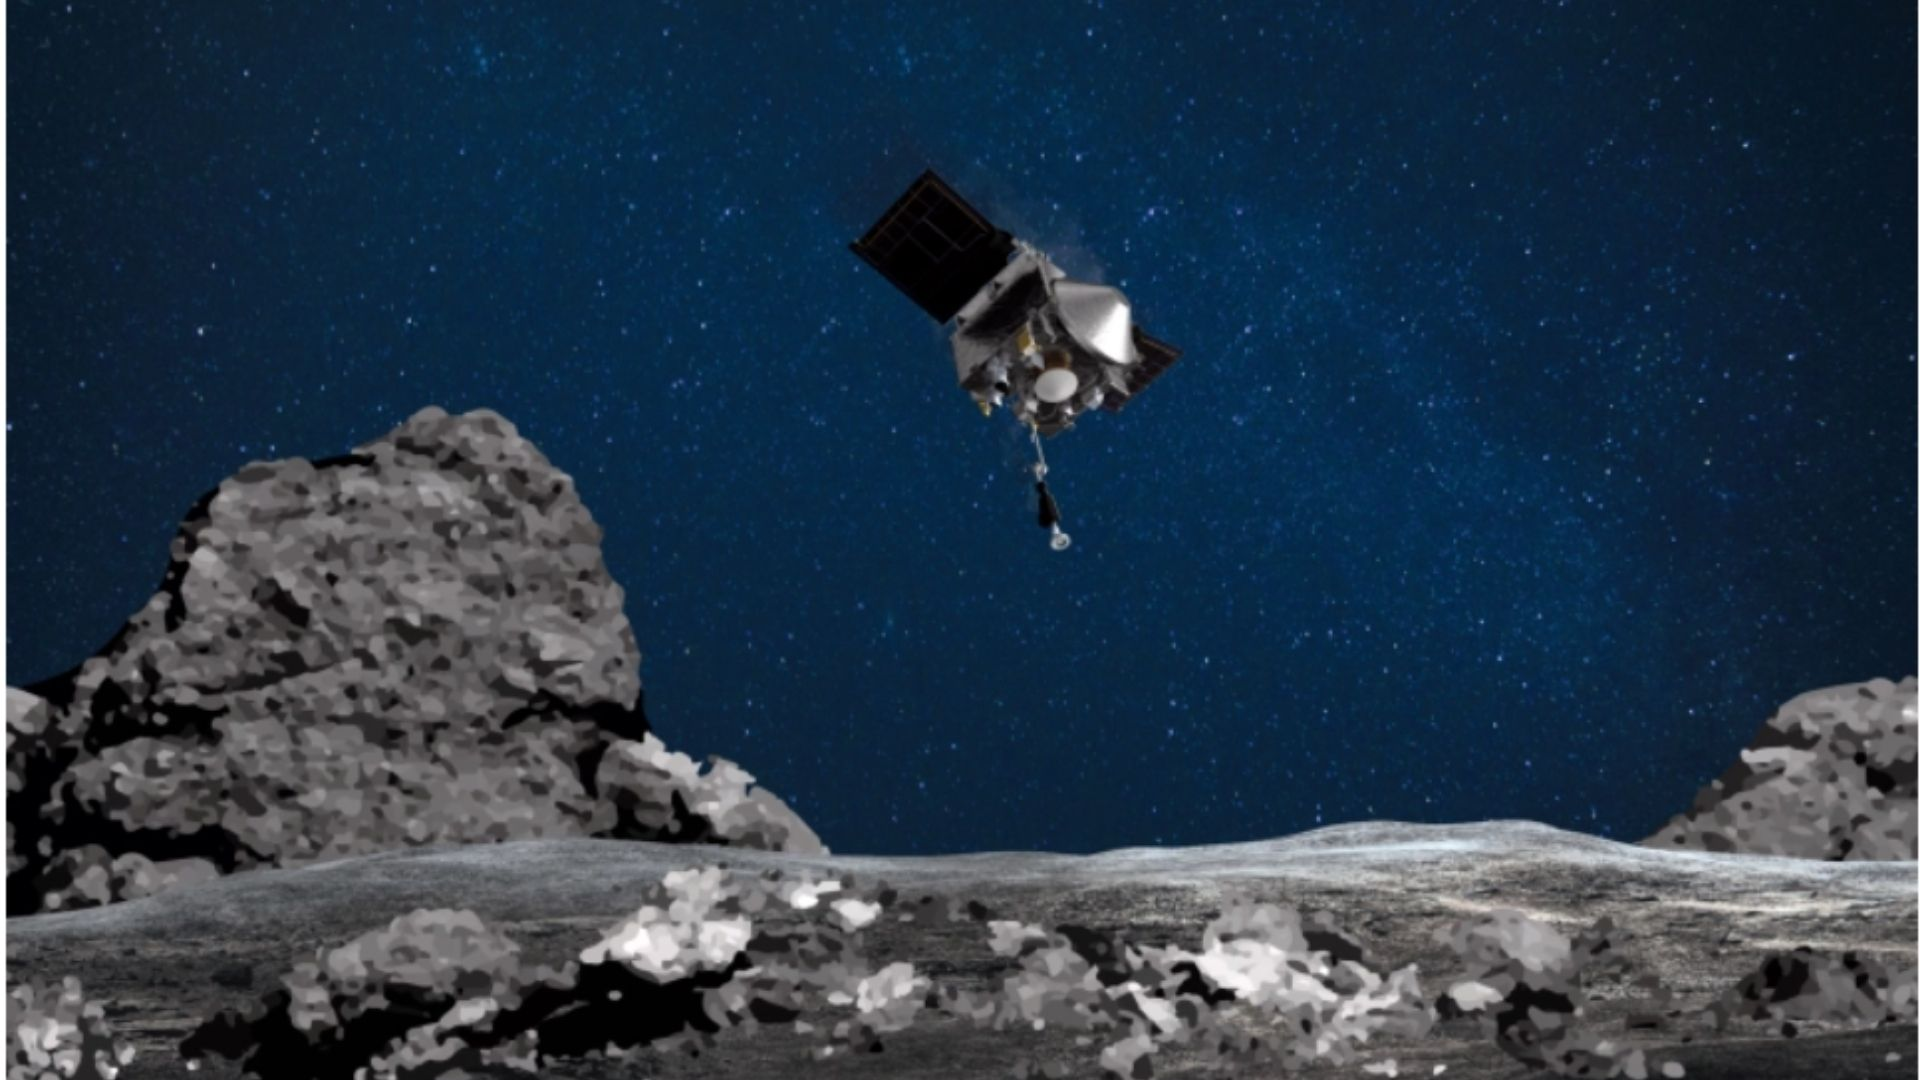 NASA-ს ხომალდმა ასტეროიდიდან ქვის ნიმუშების მოპოვება შეძლო